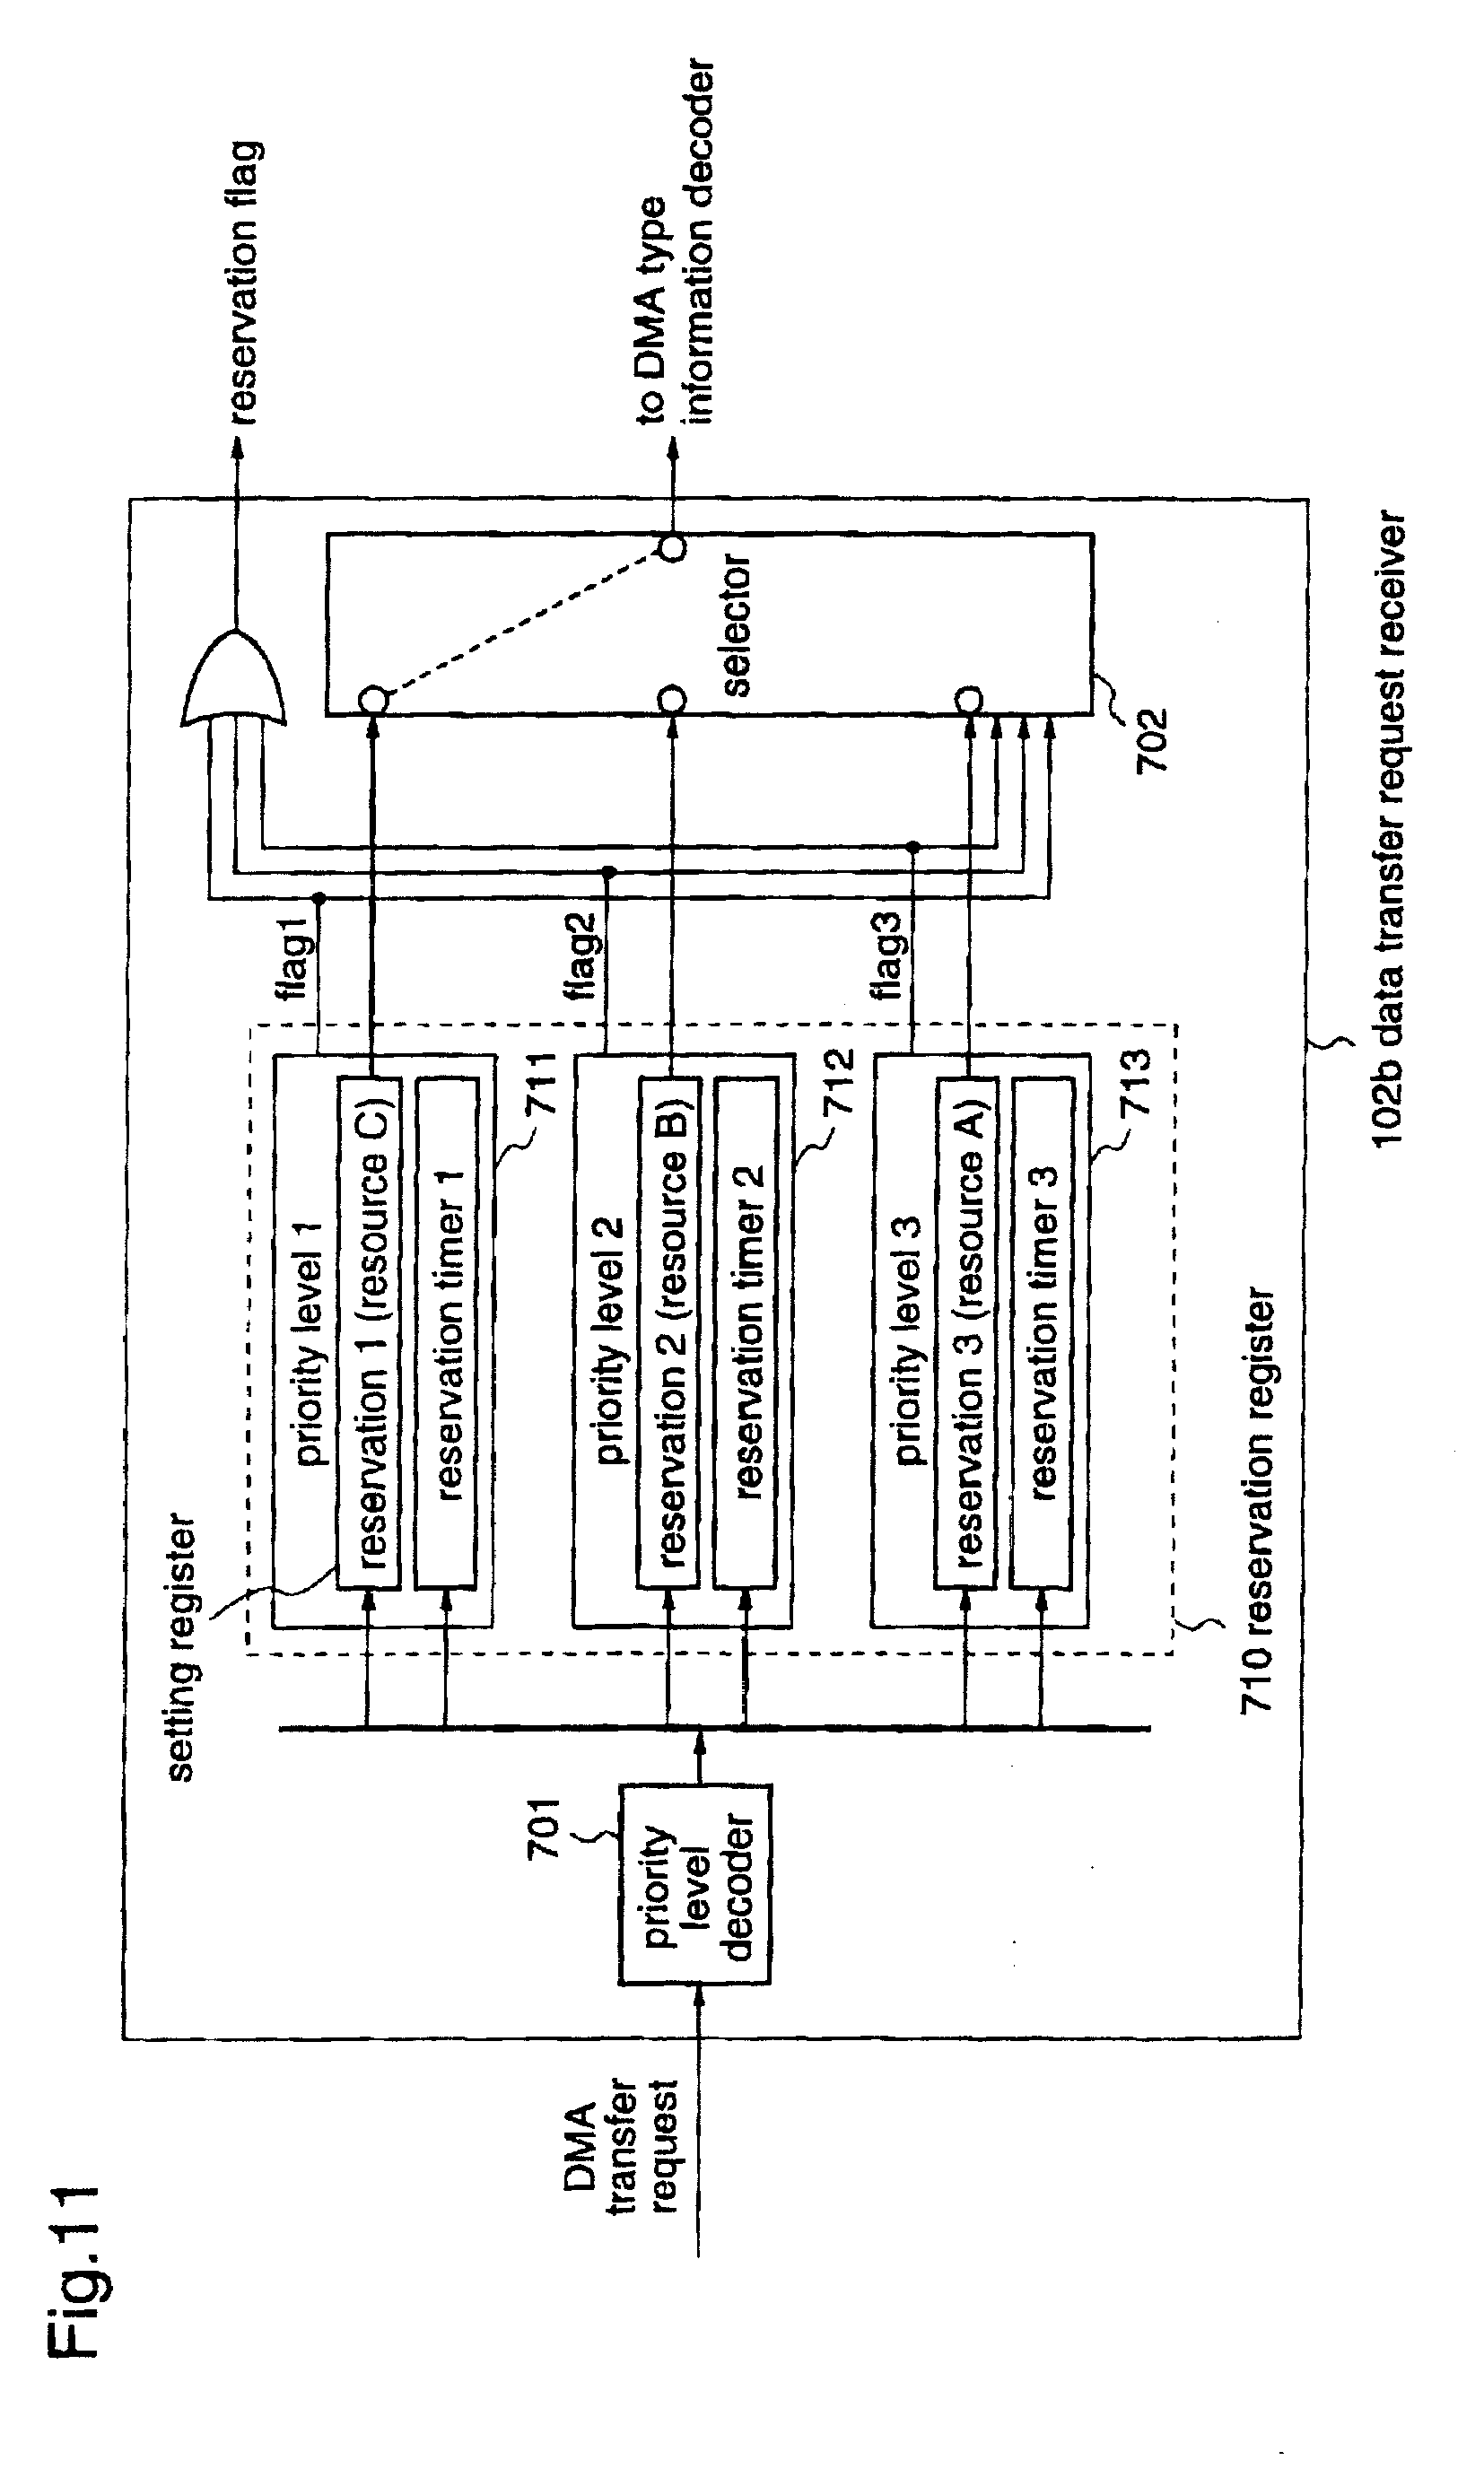 专利ep1713005a1 - high-performance dma controller